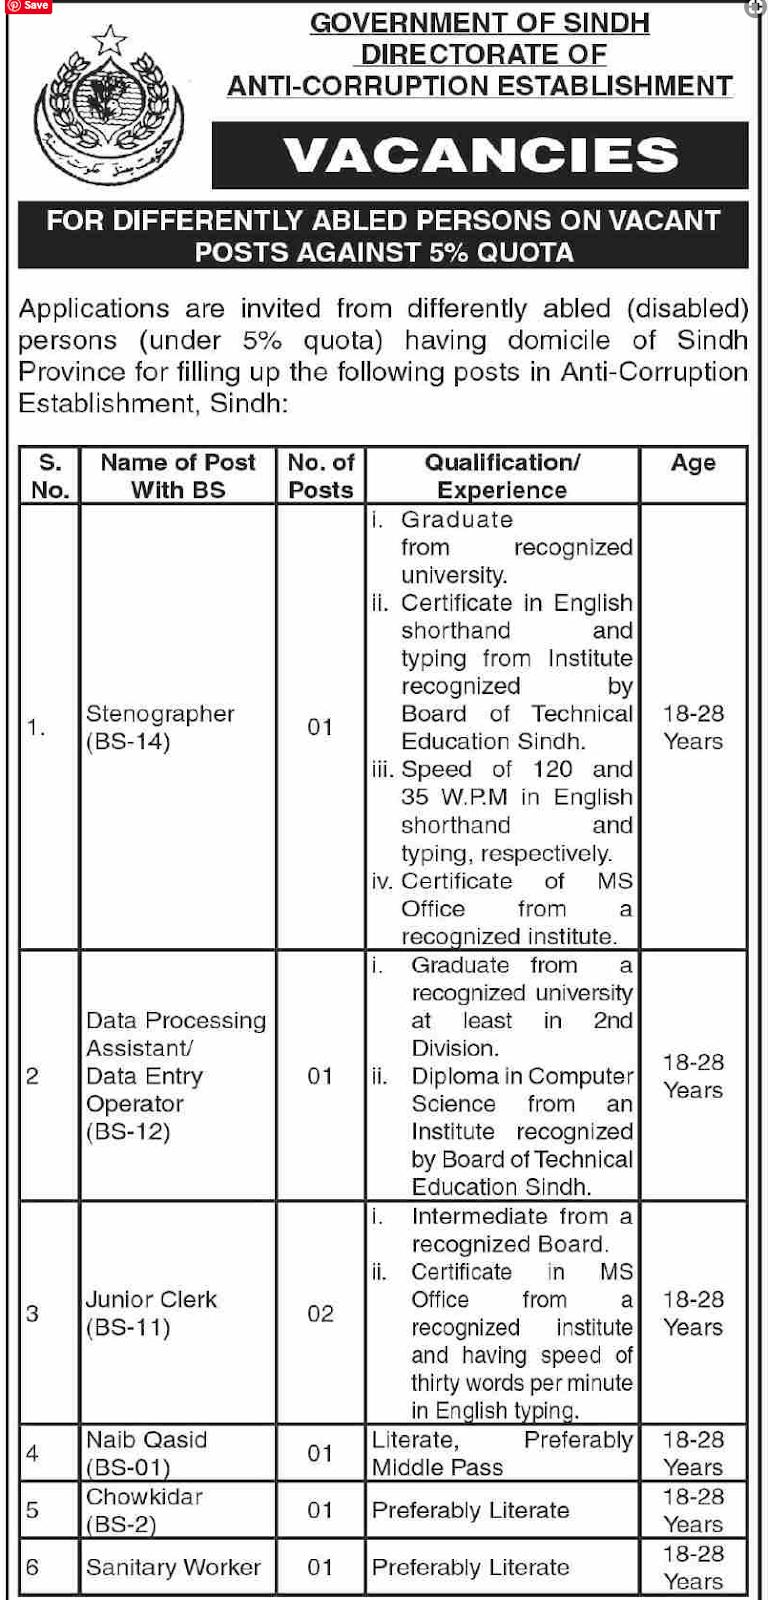 Jobs in Anti-Corruption Establishment Govt of Sindh 2020